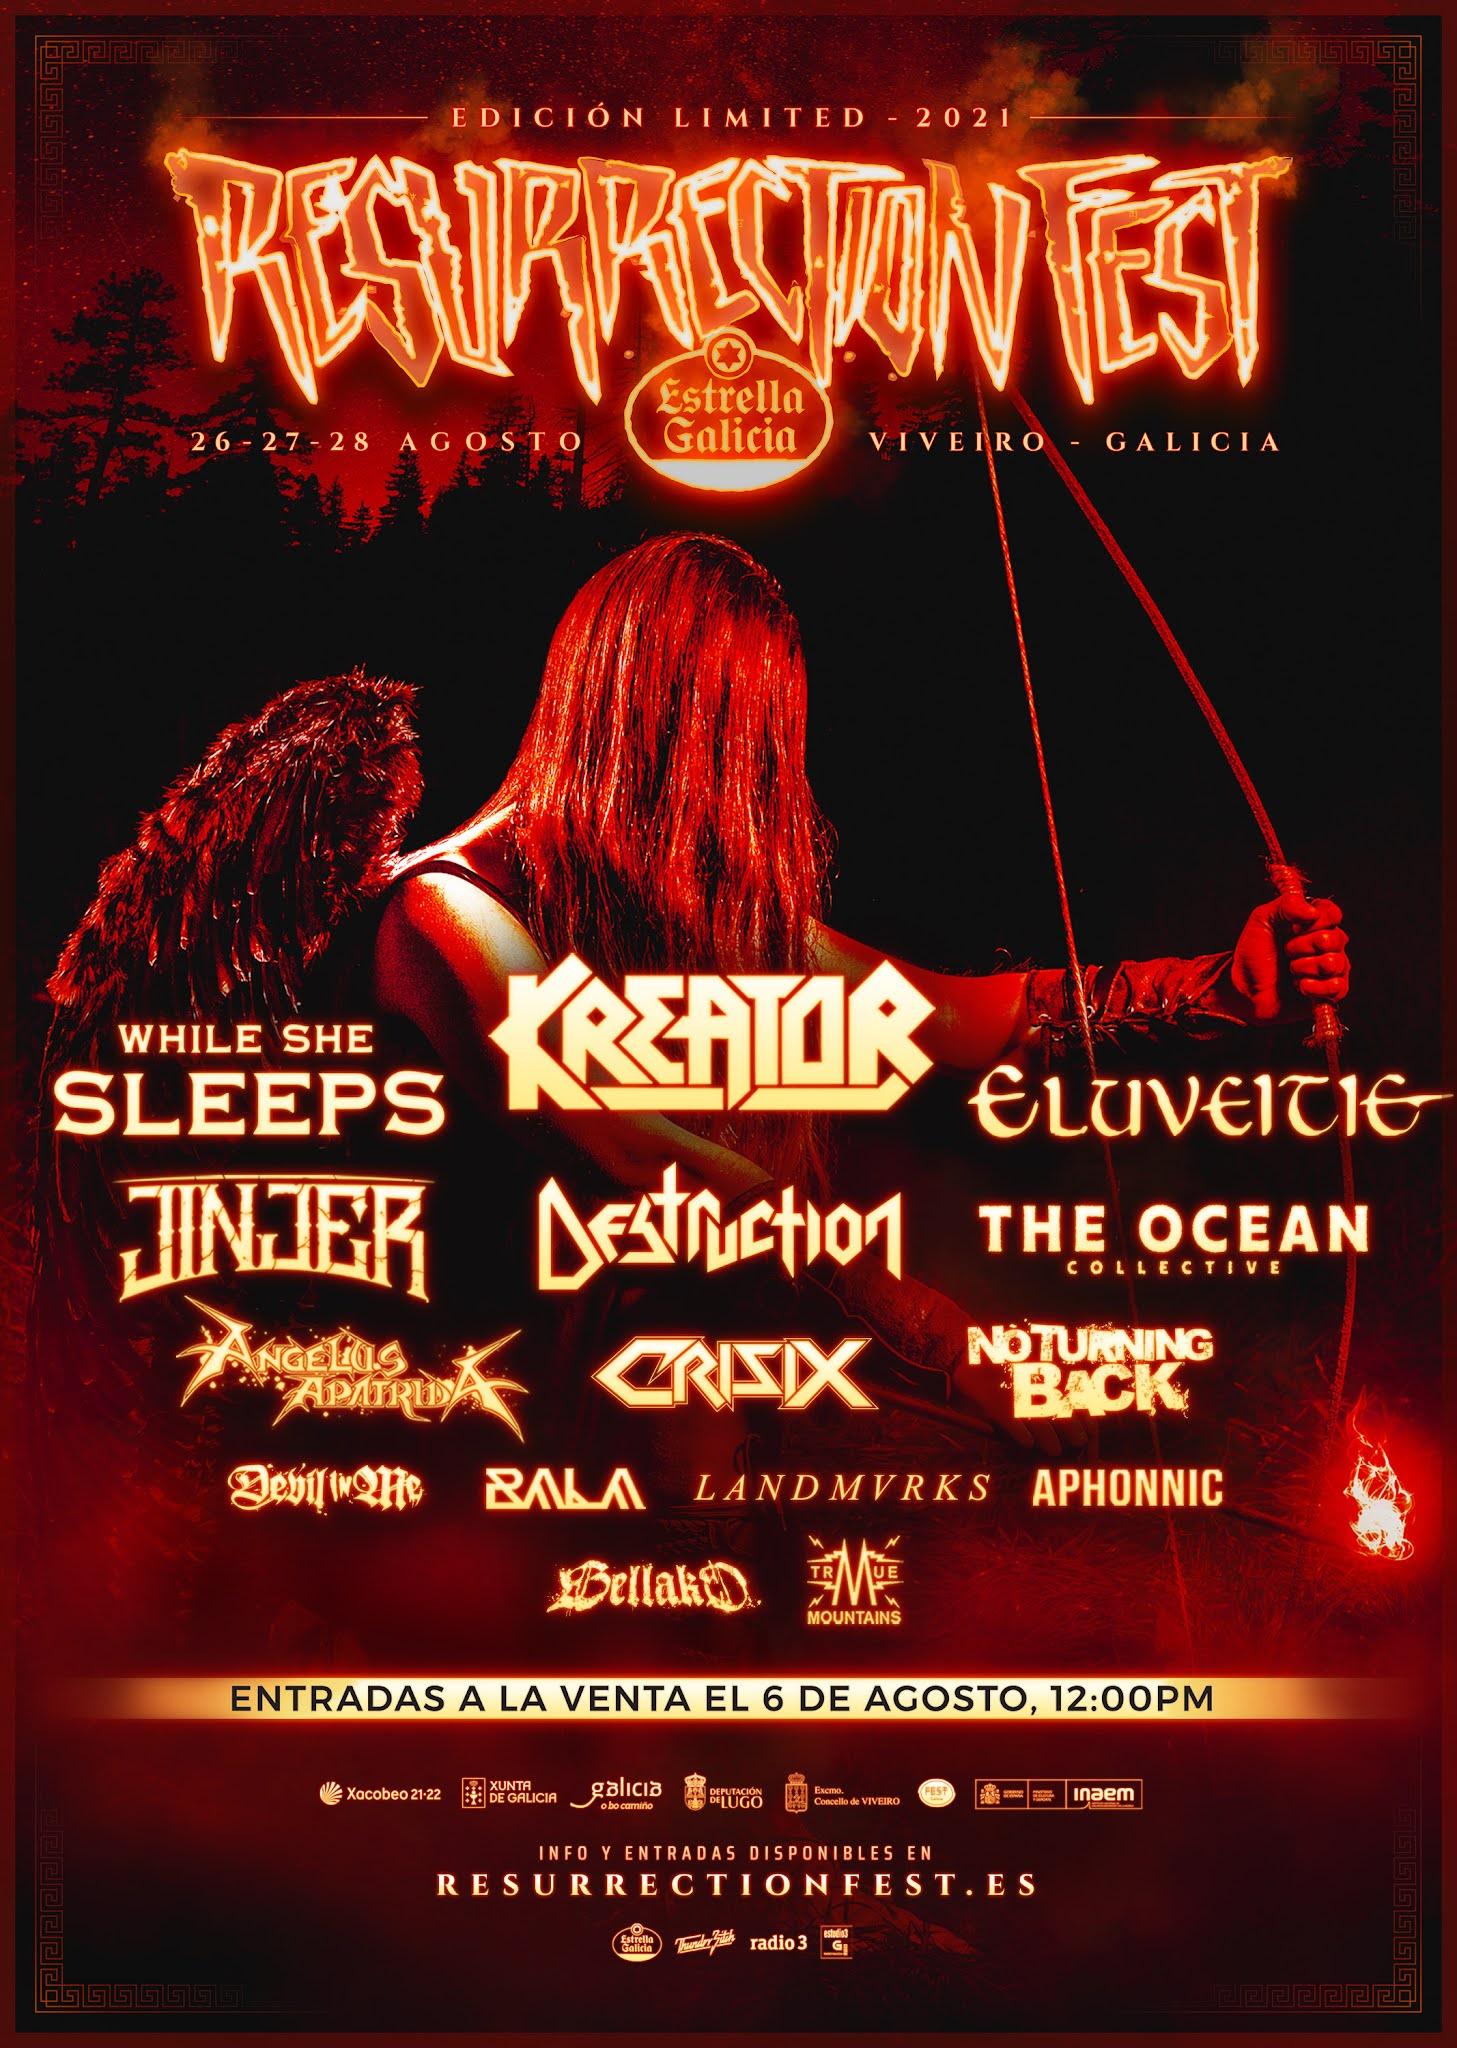 Resurrection Fest edition Limited